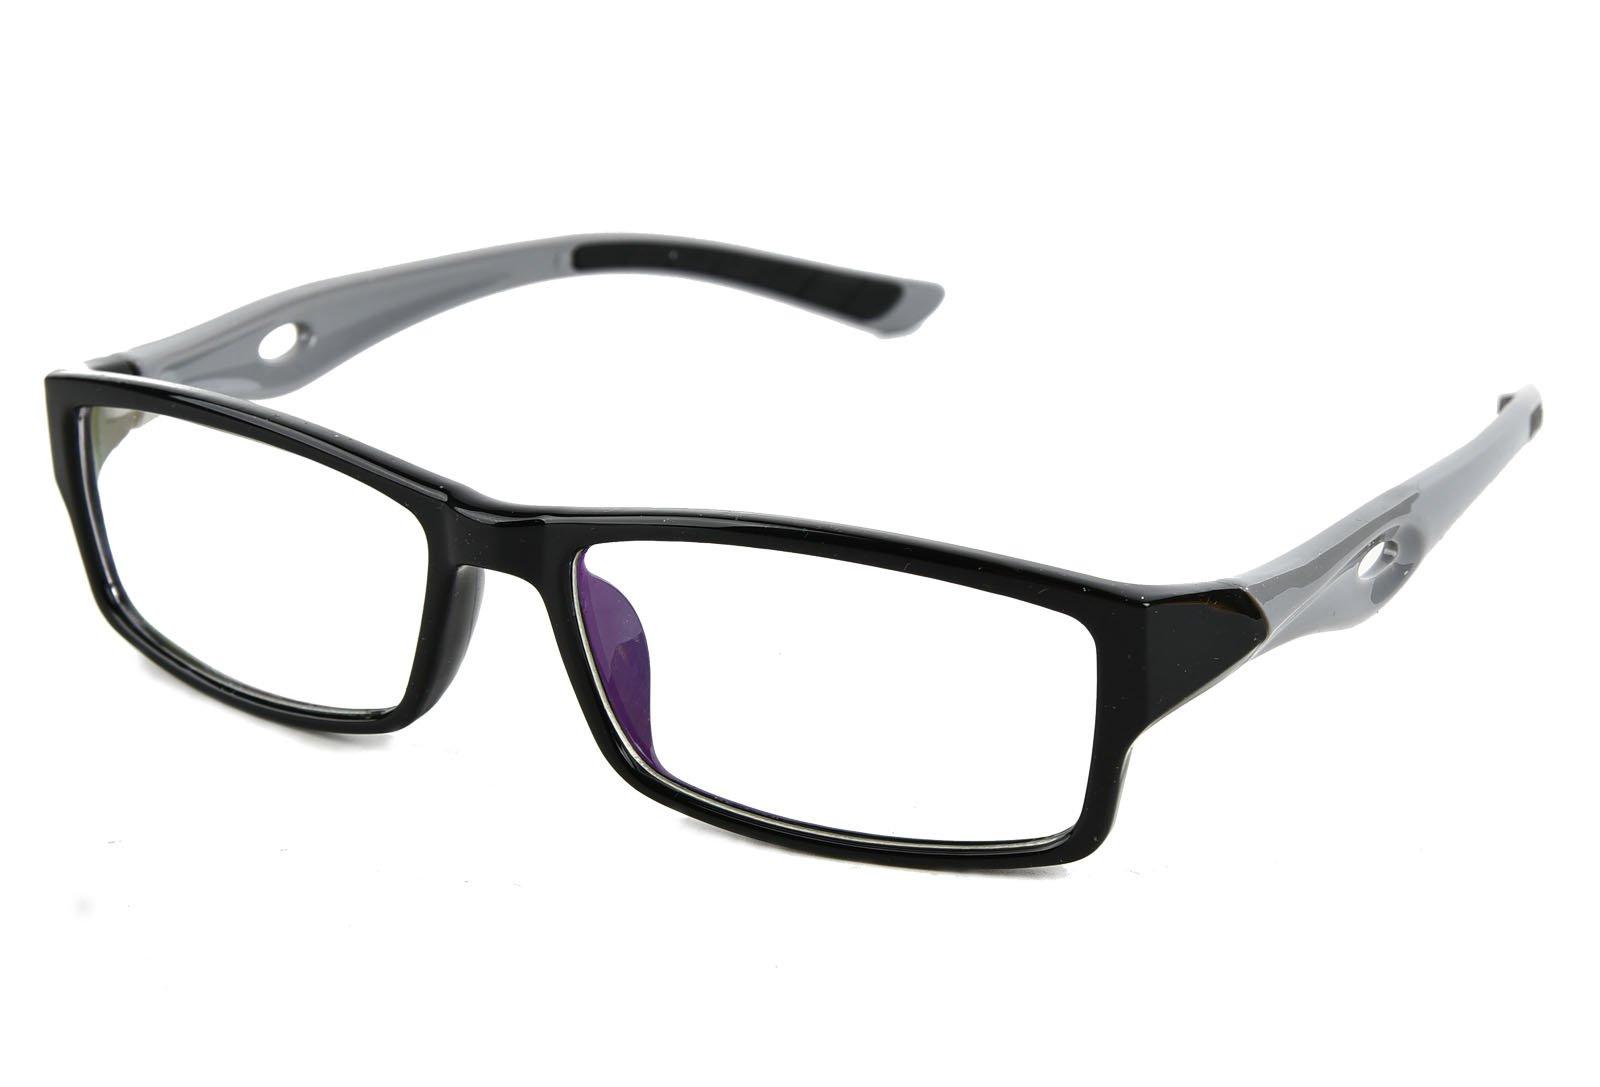 Beison Sports Optical Eyeglasses Frame Plain Glasses Clear Lens UV400 (Black frame with grey temples, 53mm)